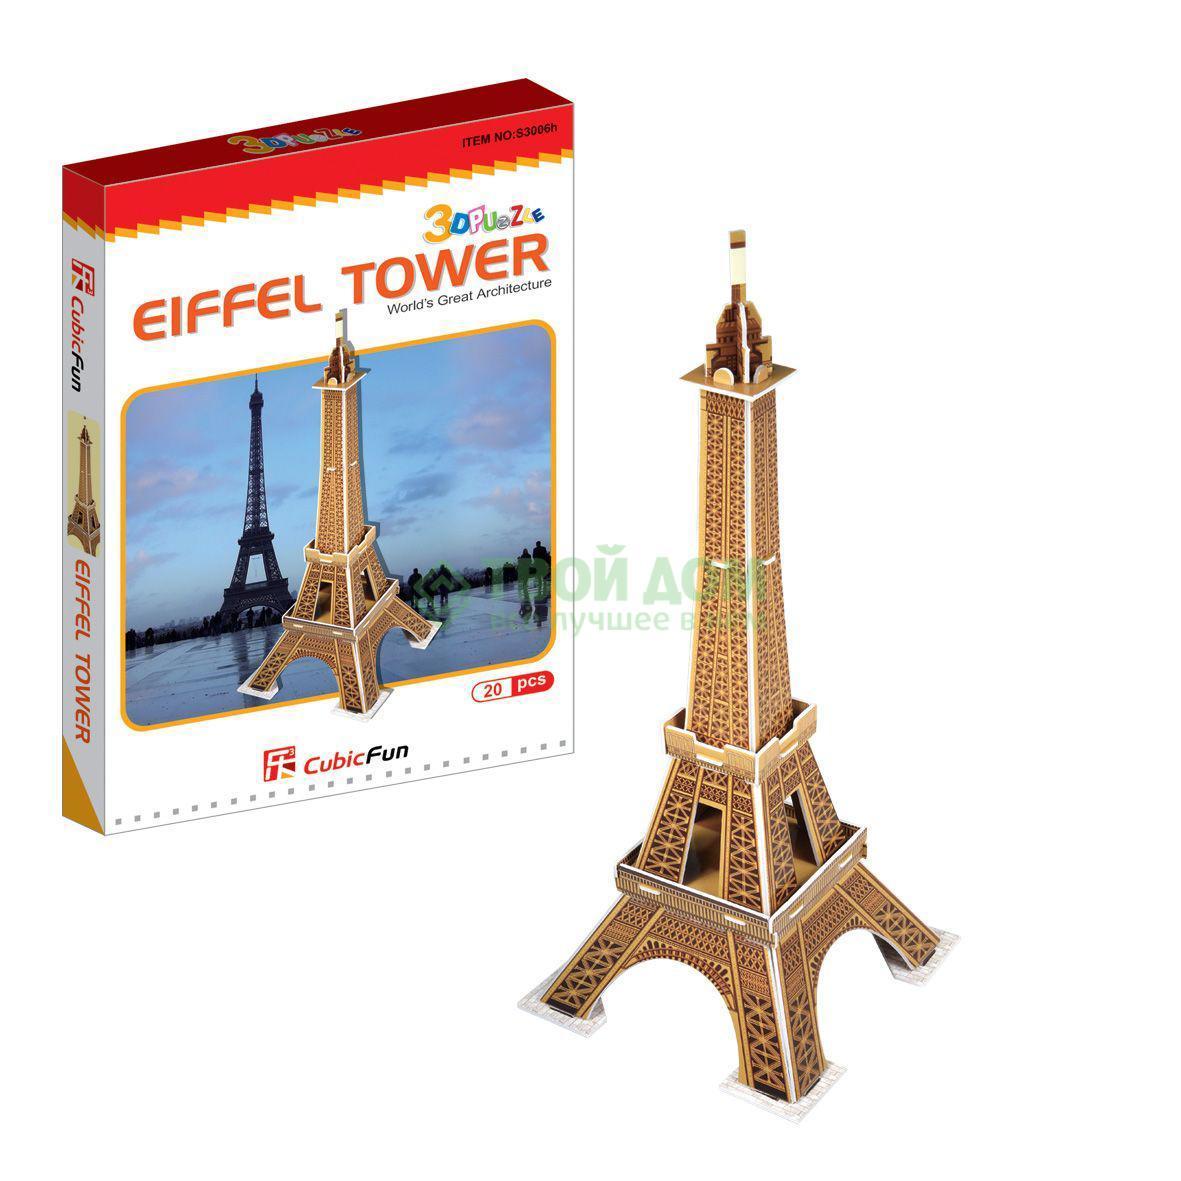 3D-пазл CubicFun Эйфелева башня (S3006)